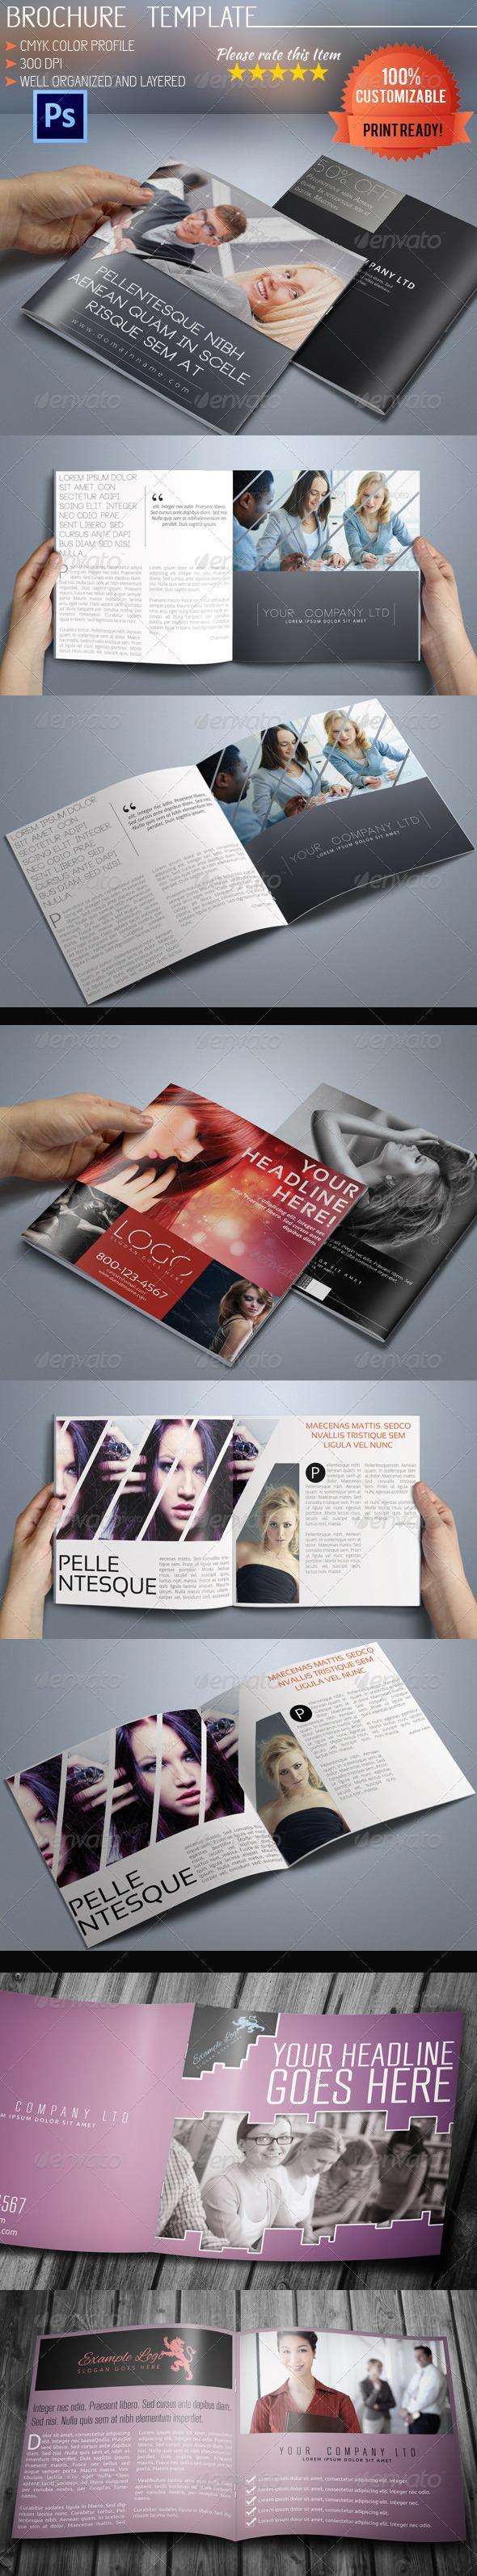 GraphicRiver Square Brochure Bundle 6323279